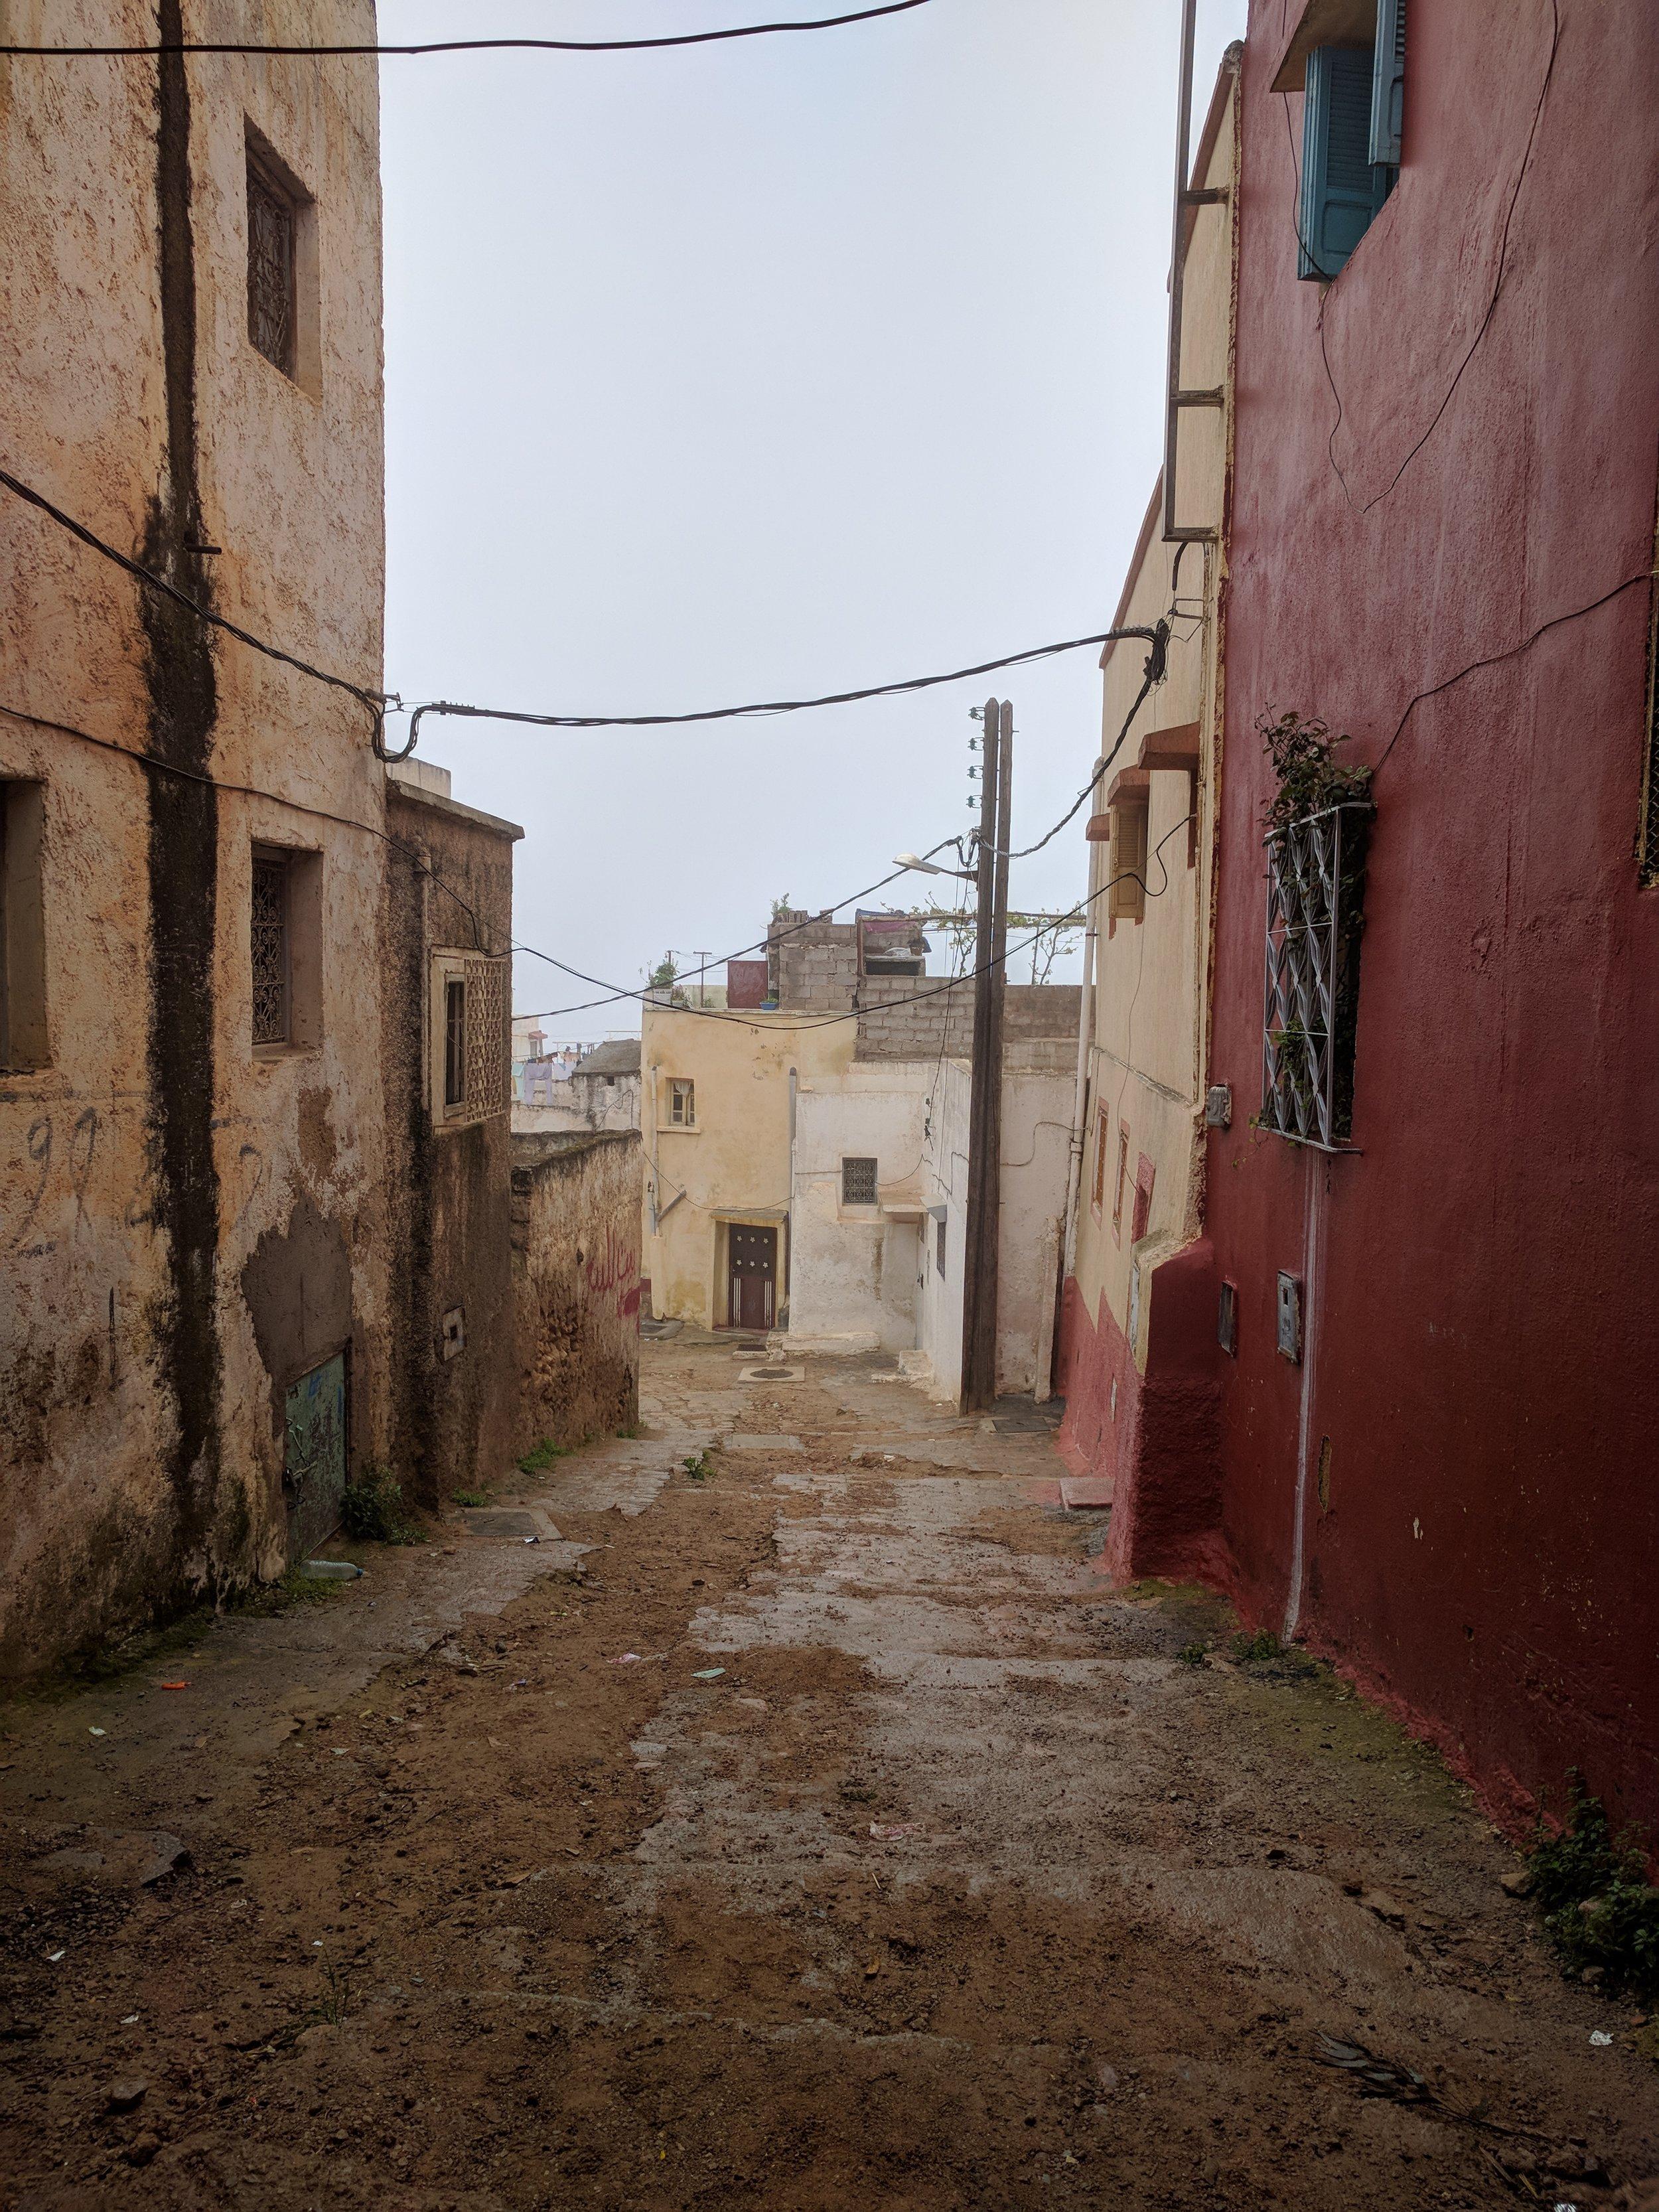 A street in Bhalil